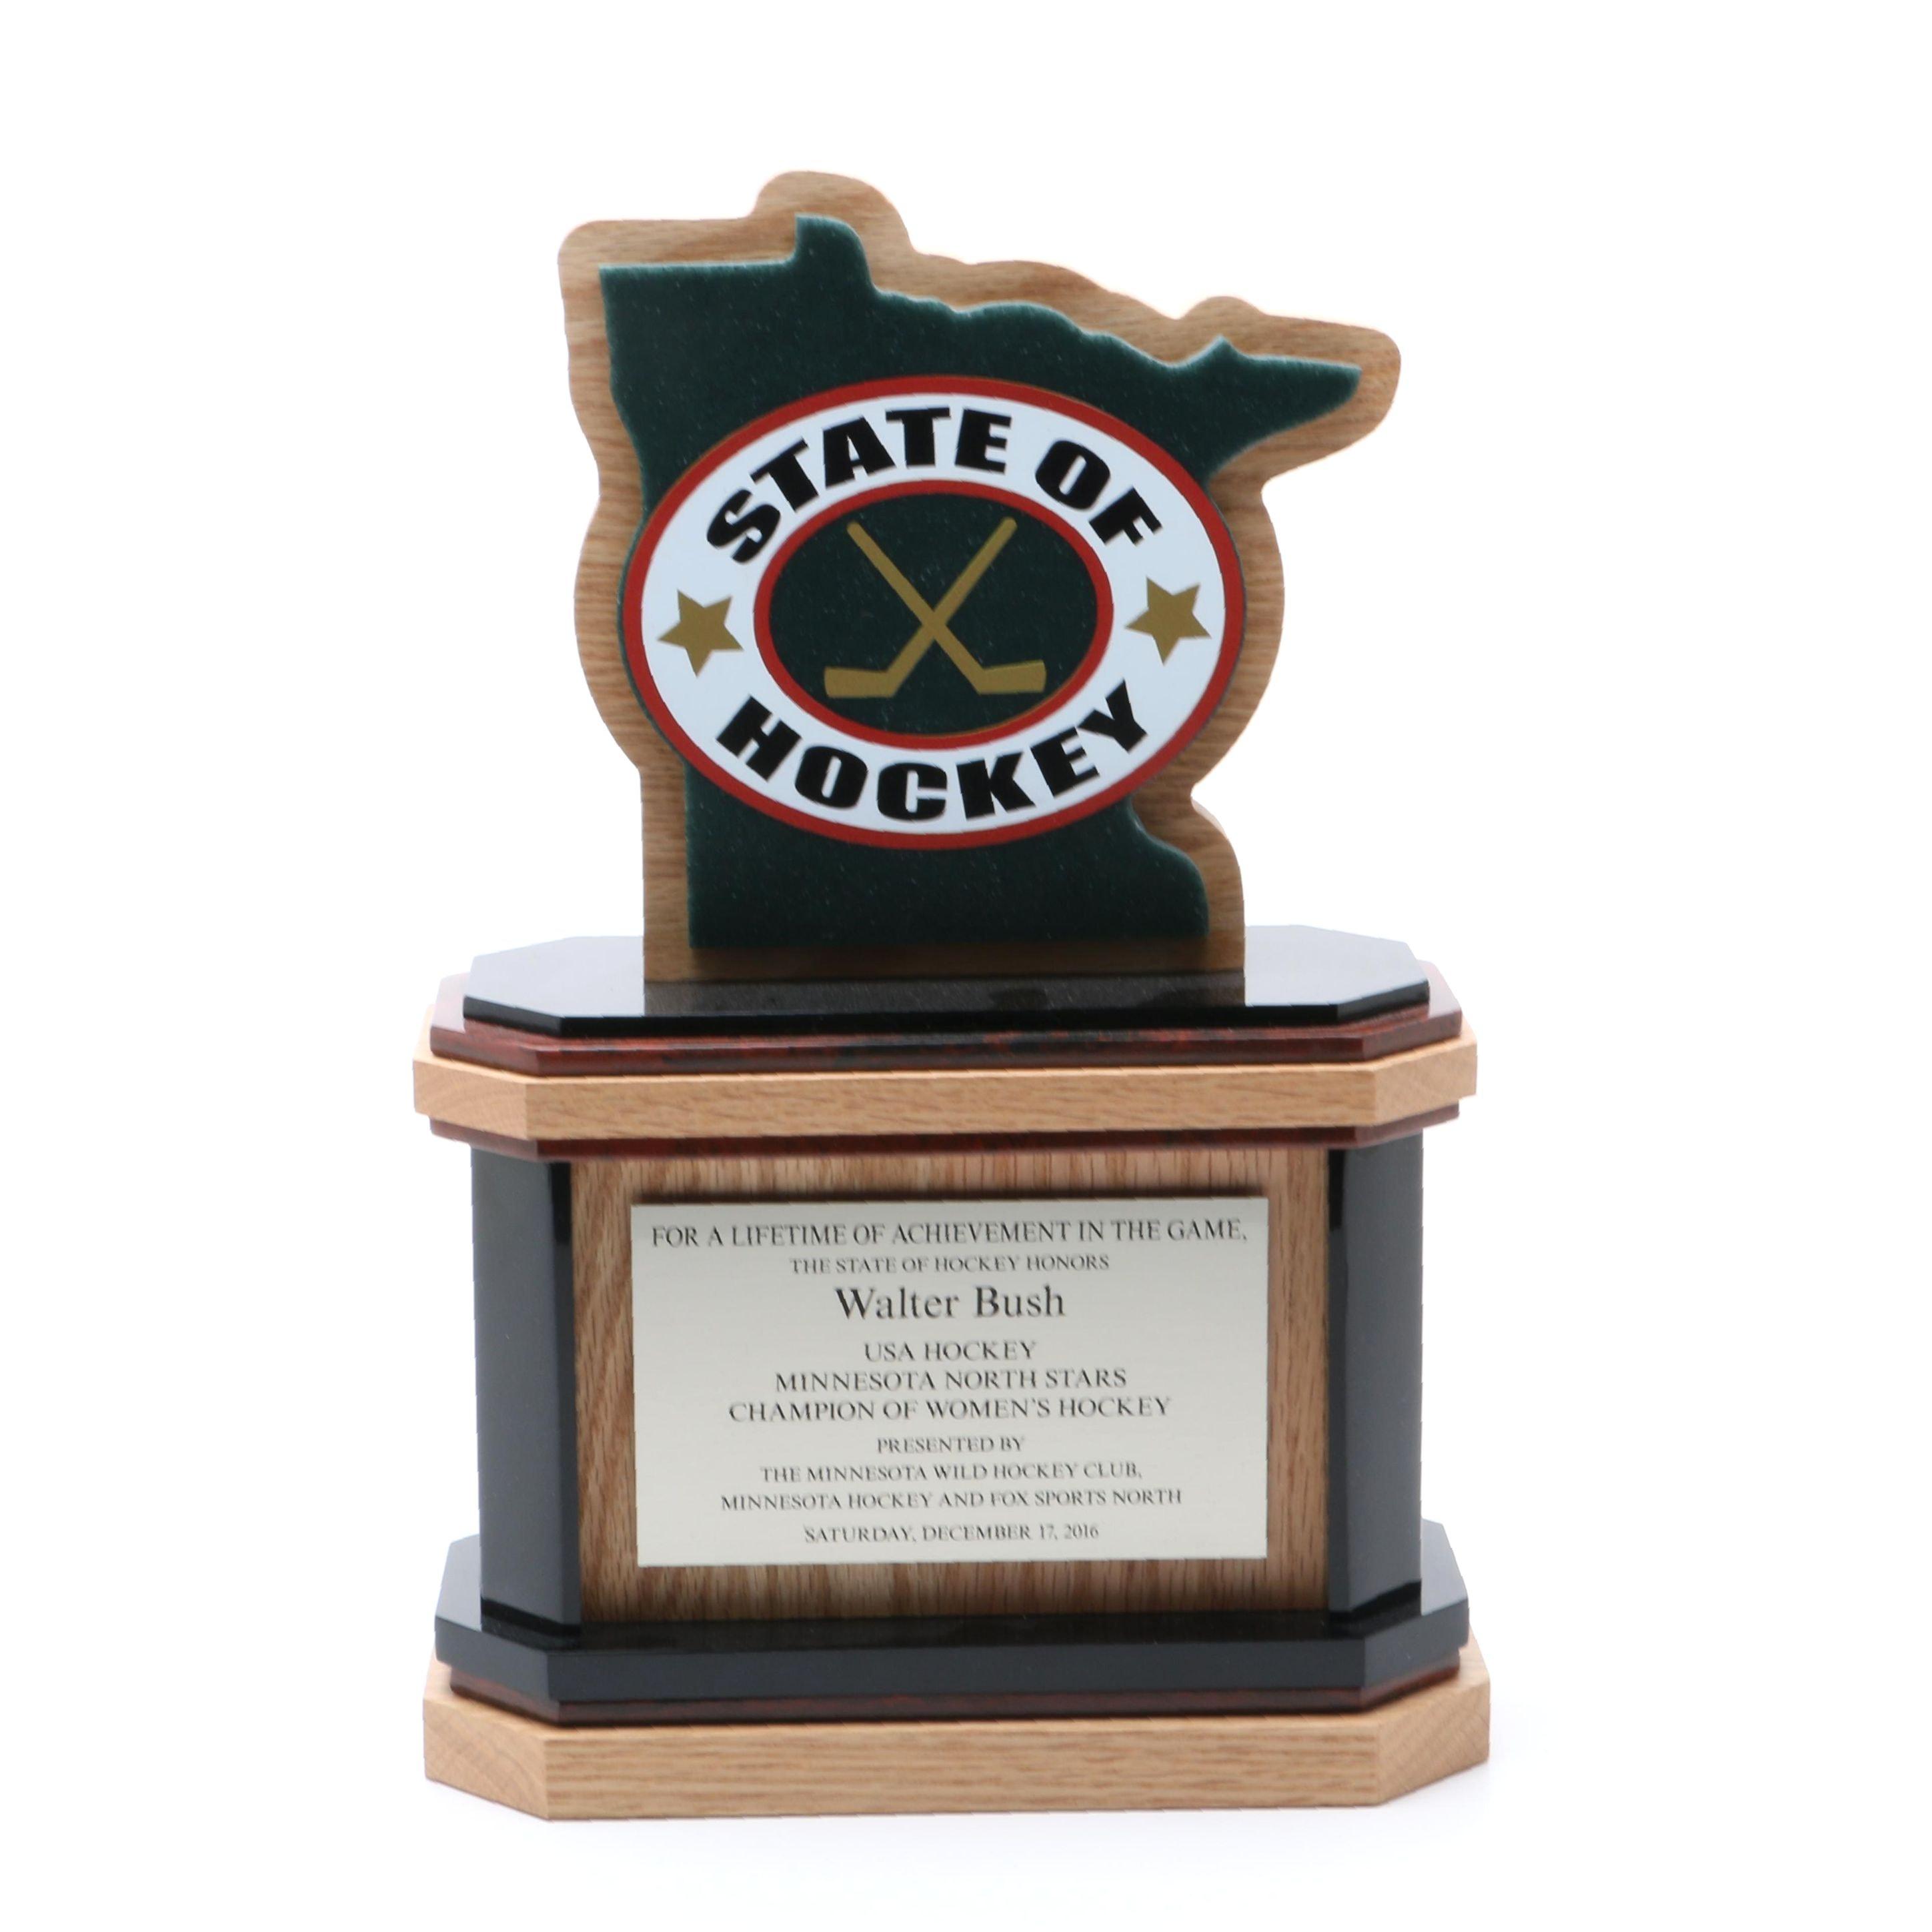 State of Hockey Walter Bush Lifetime of Achievement Award Trophy